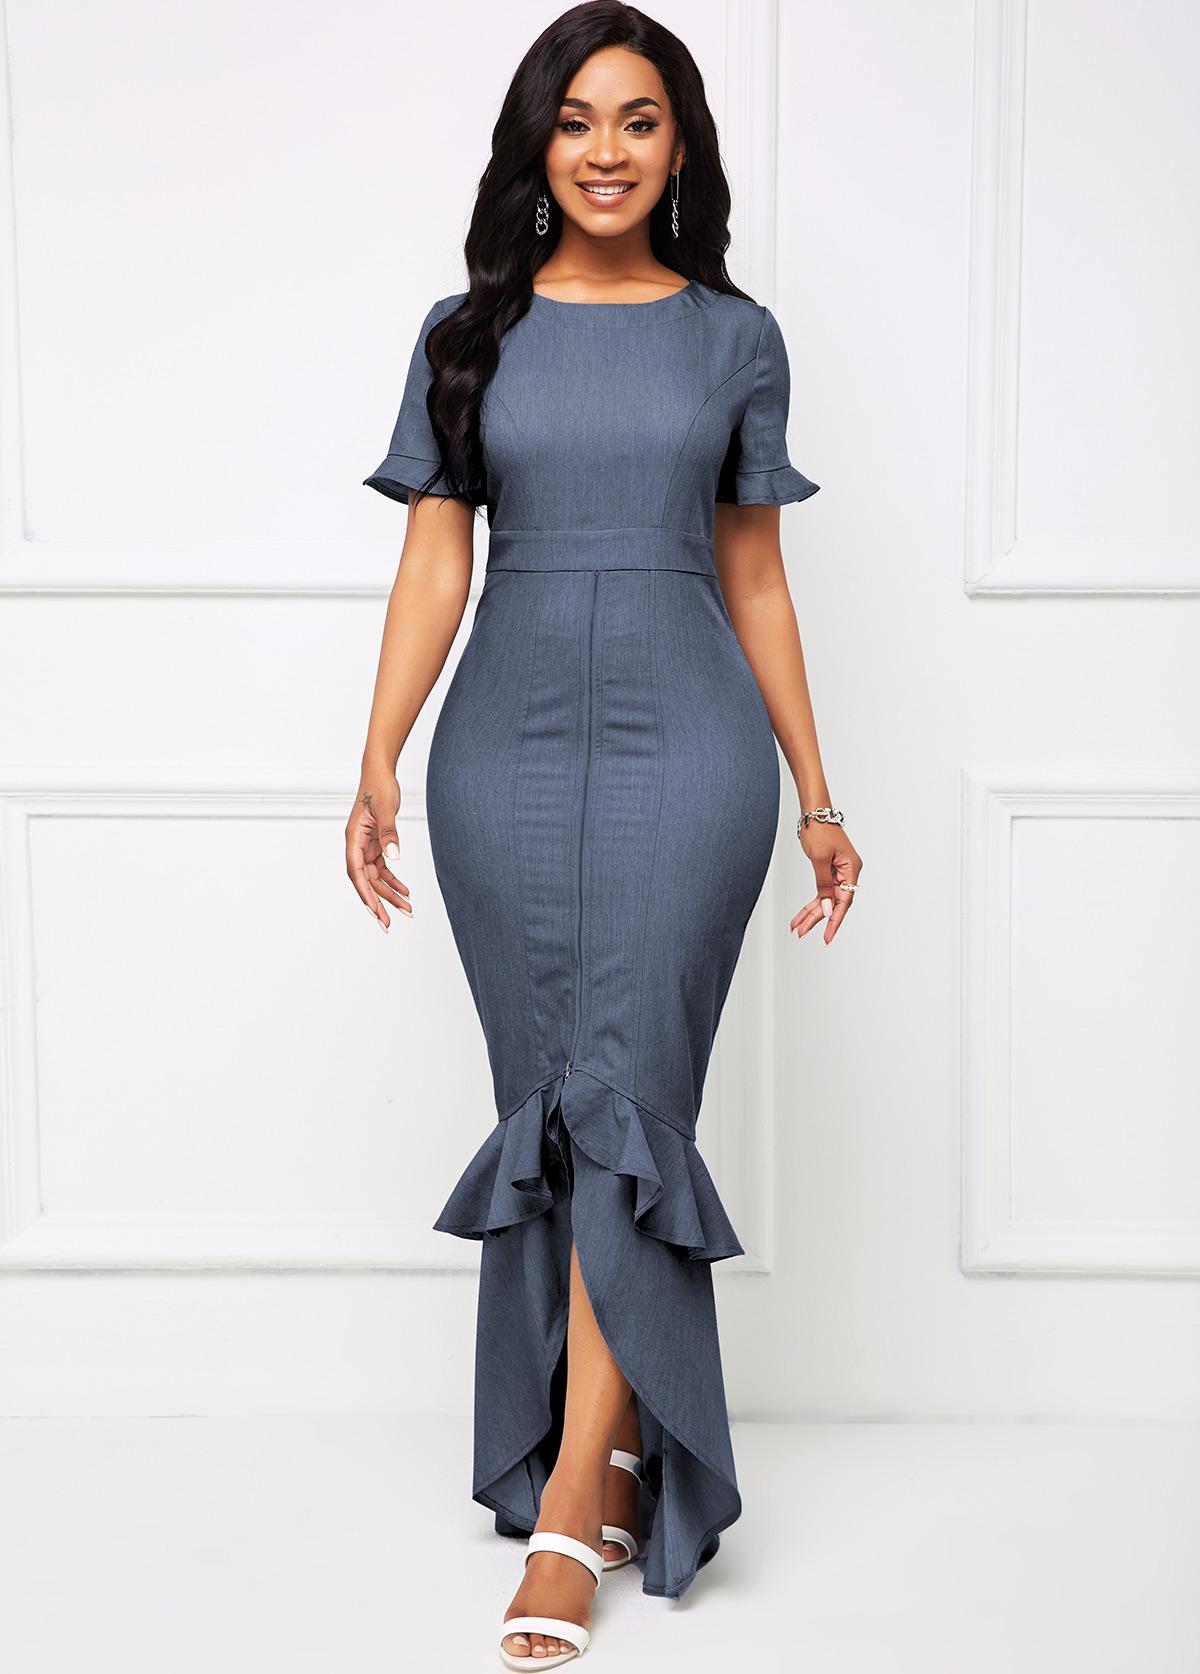 Short Sleeve Flounce Round Neck Mermaid Dress